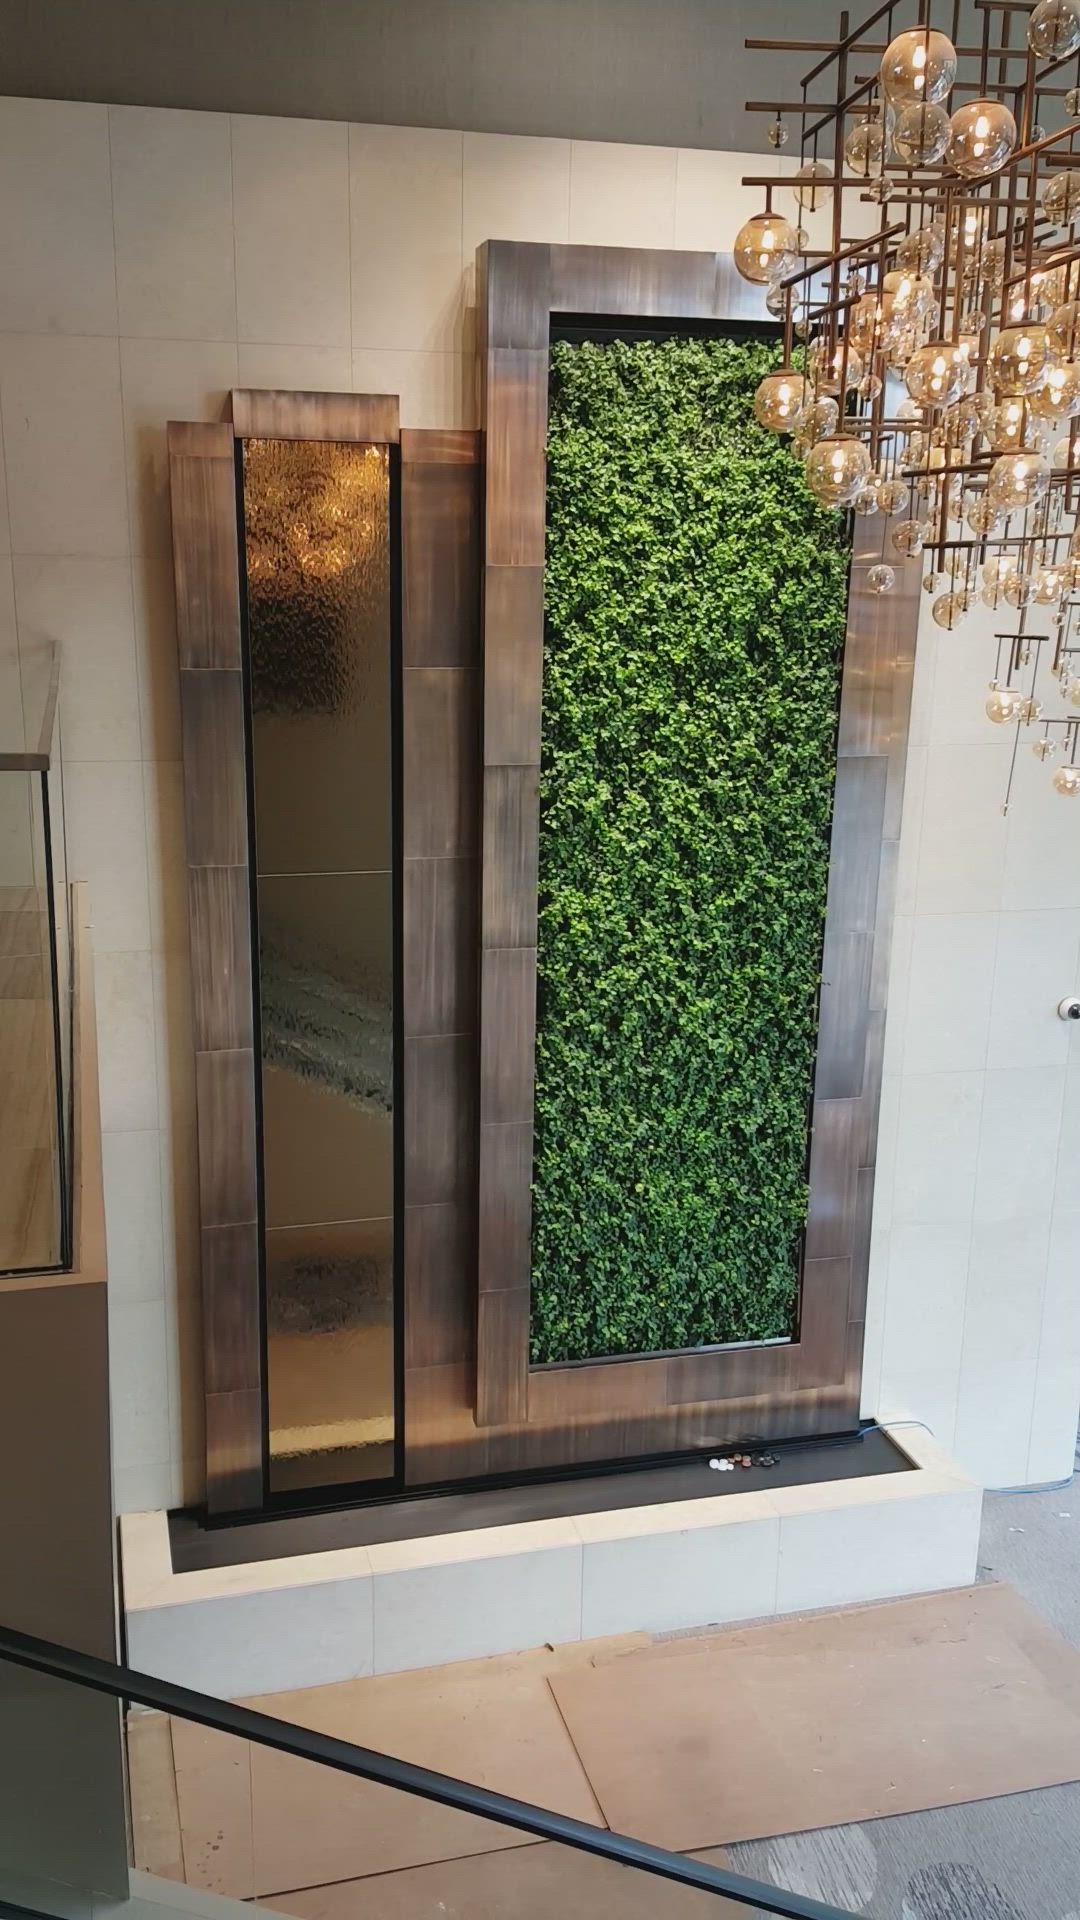 Westin Houston Hotel Houston Tx Video Wall Design Mirror Design Wall Indoor Wall Fountains